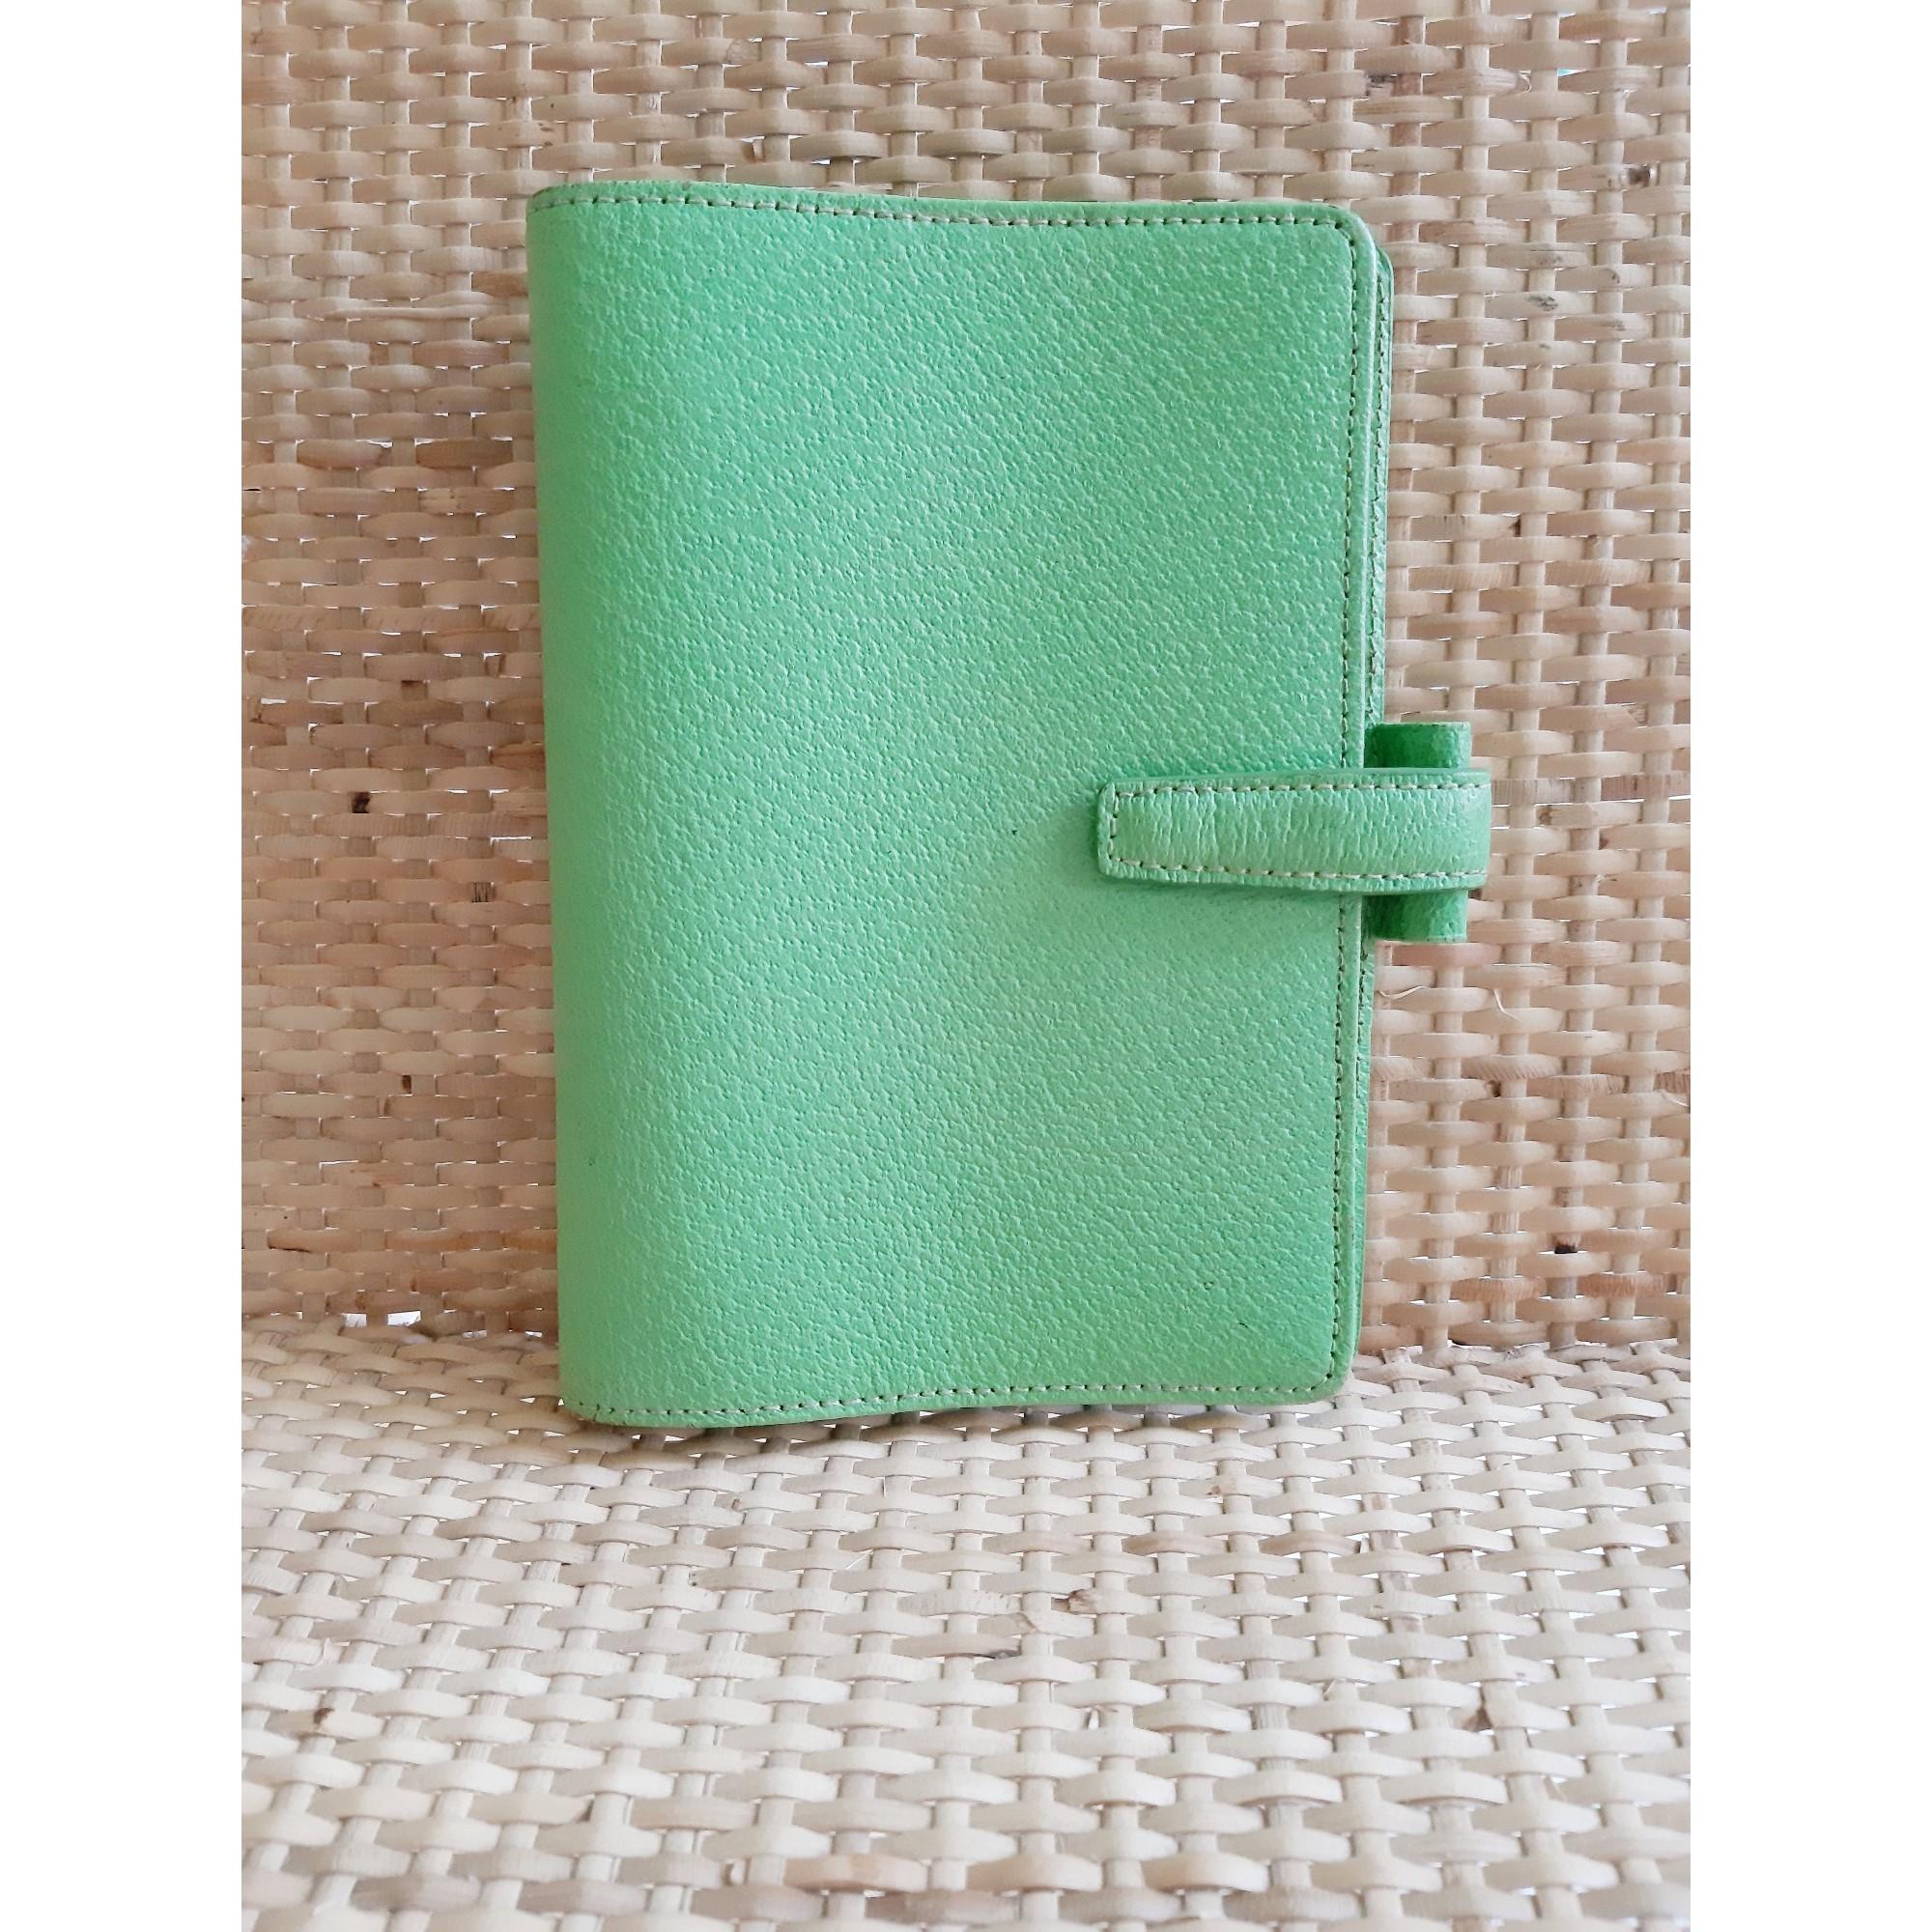 Portefeuille FILOFAX cuir vert